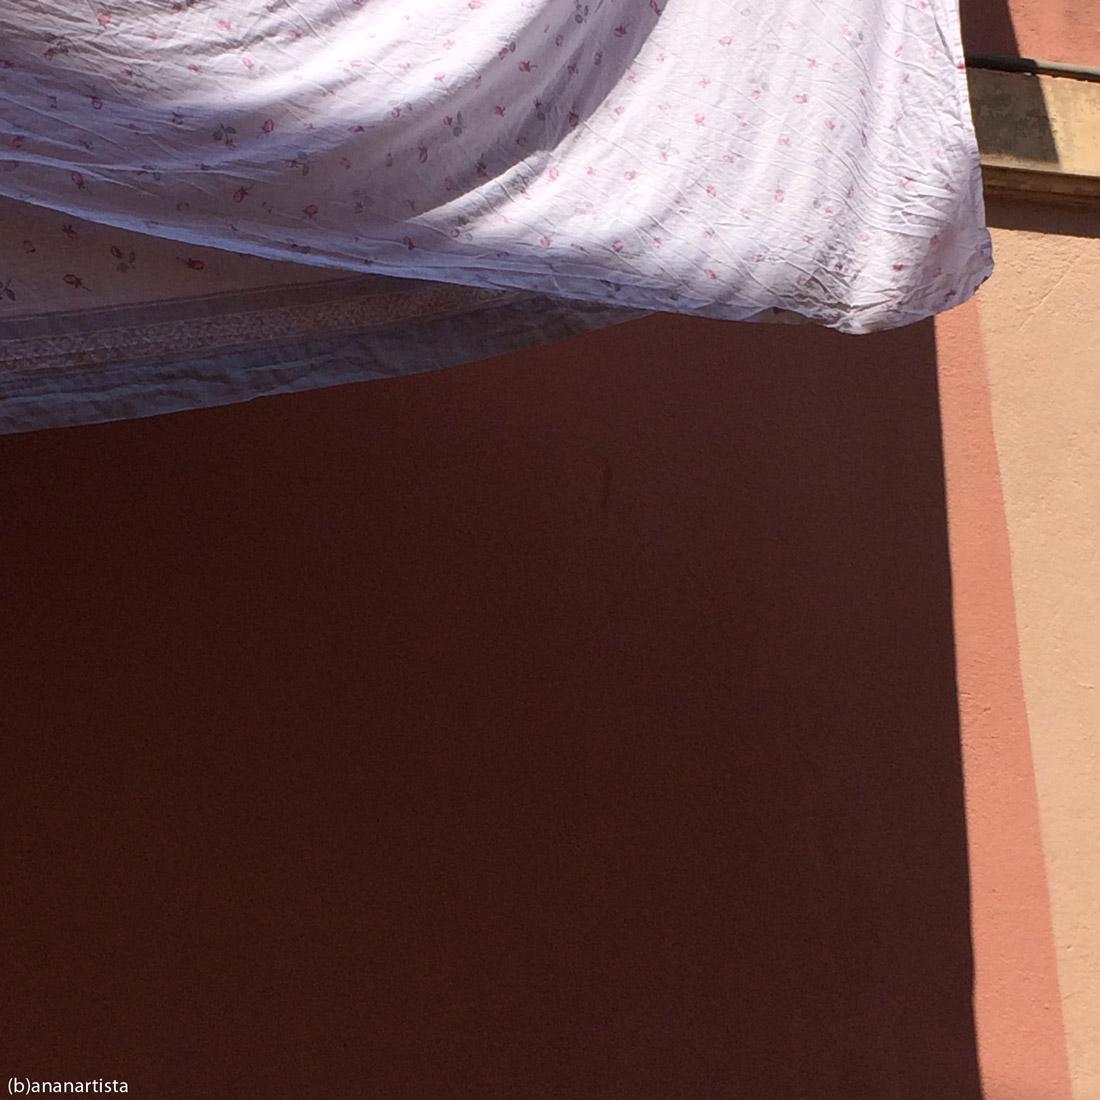 Schleier der Maya: abstract photography by (b)ananartista sbuff